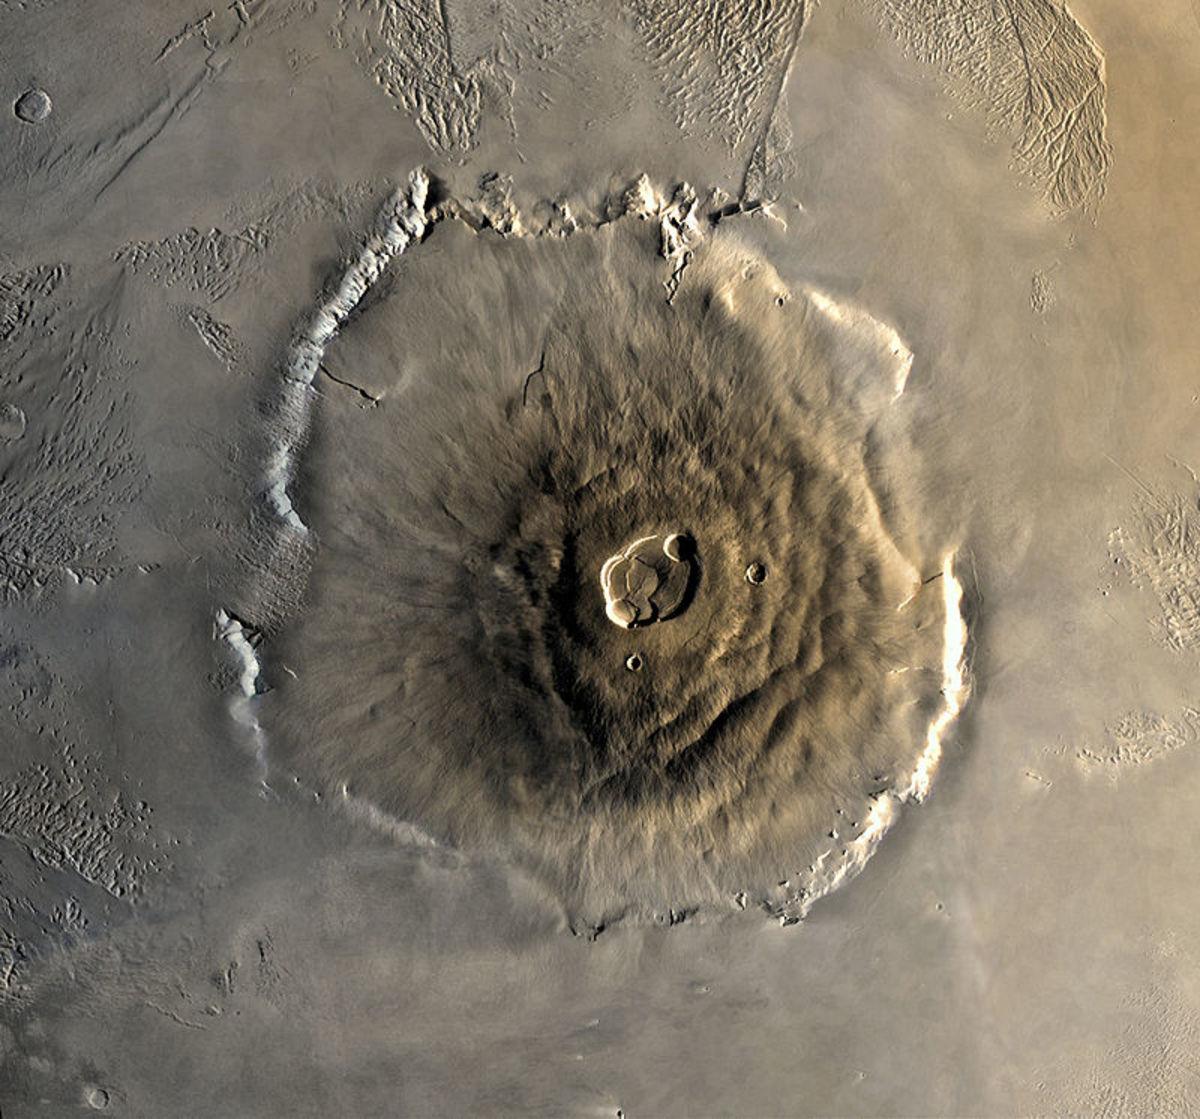 Olympus Mons, an extinct volcano on Mars